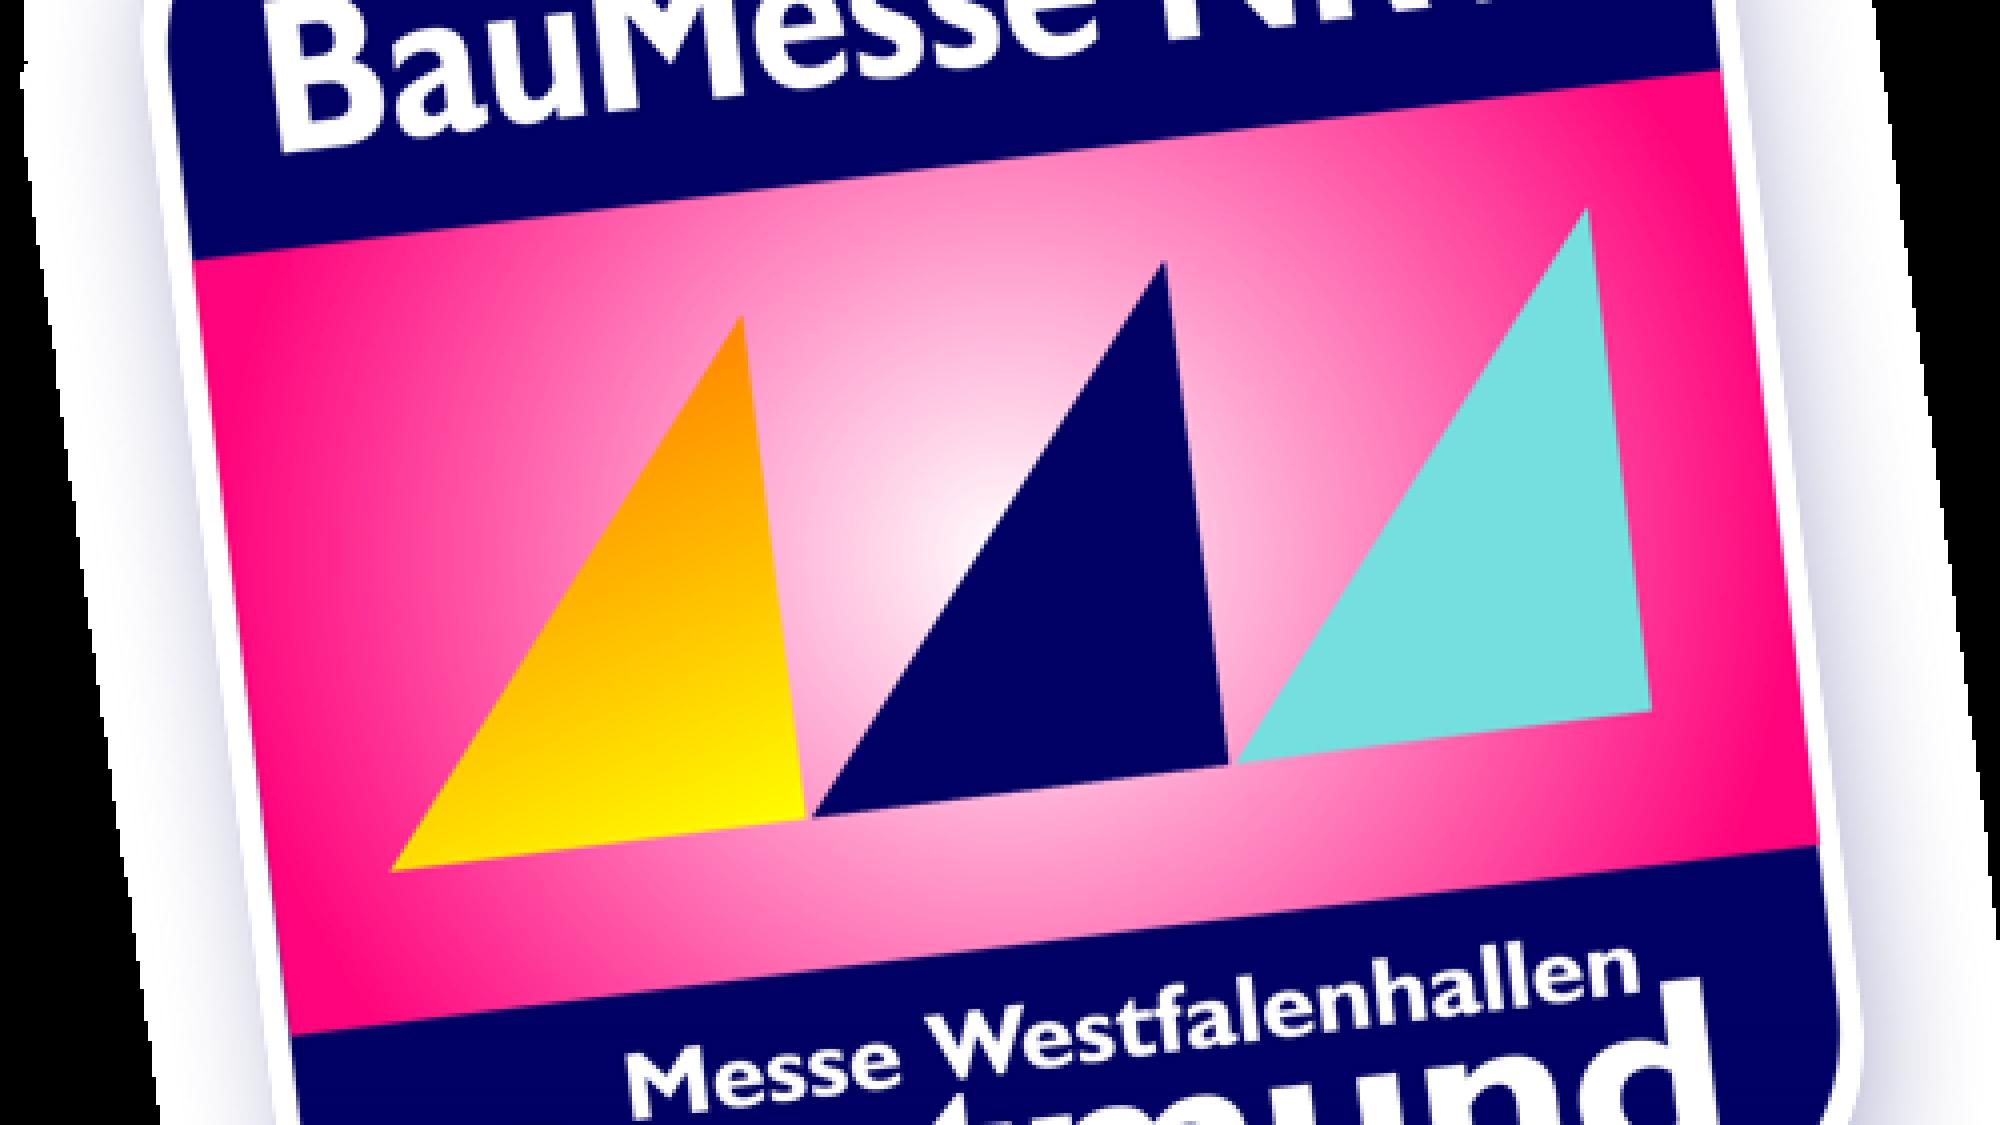 logo-baumessenrw